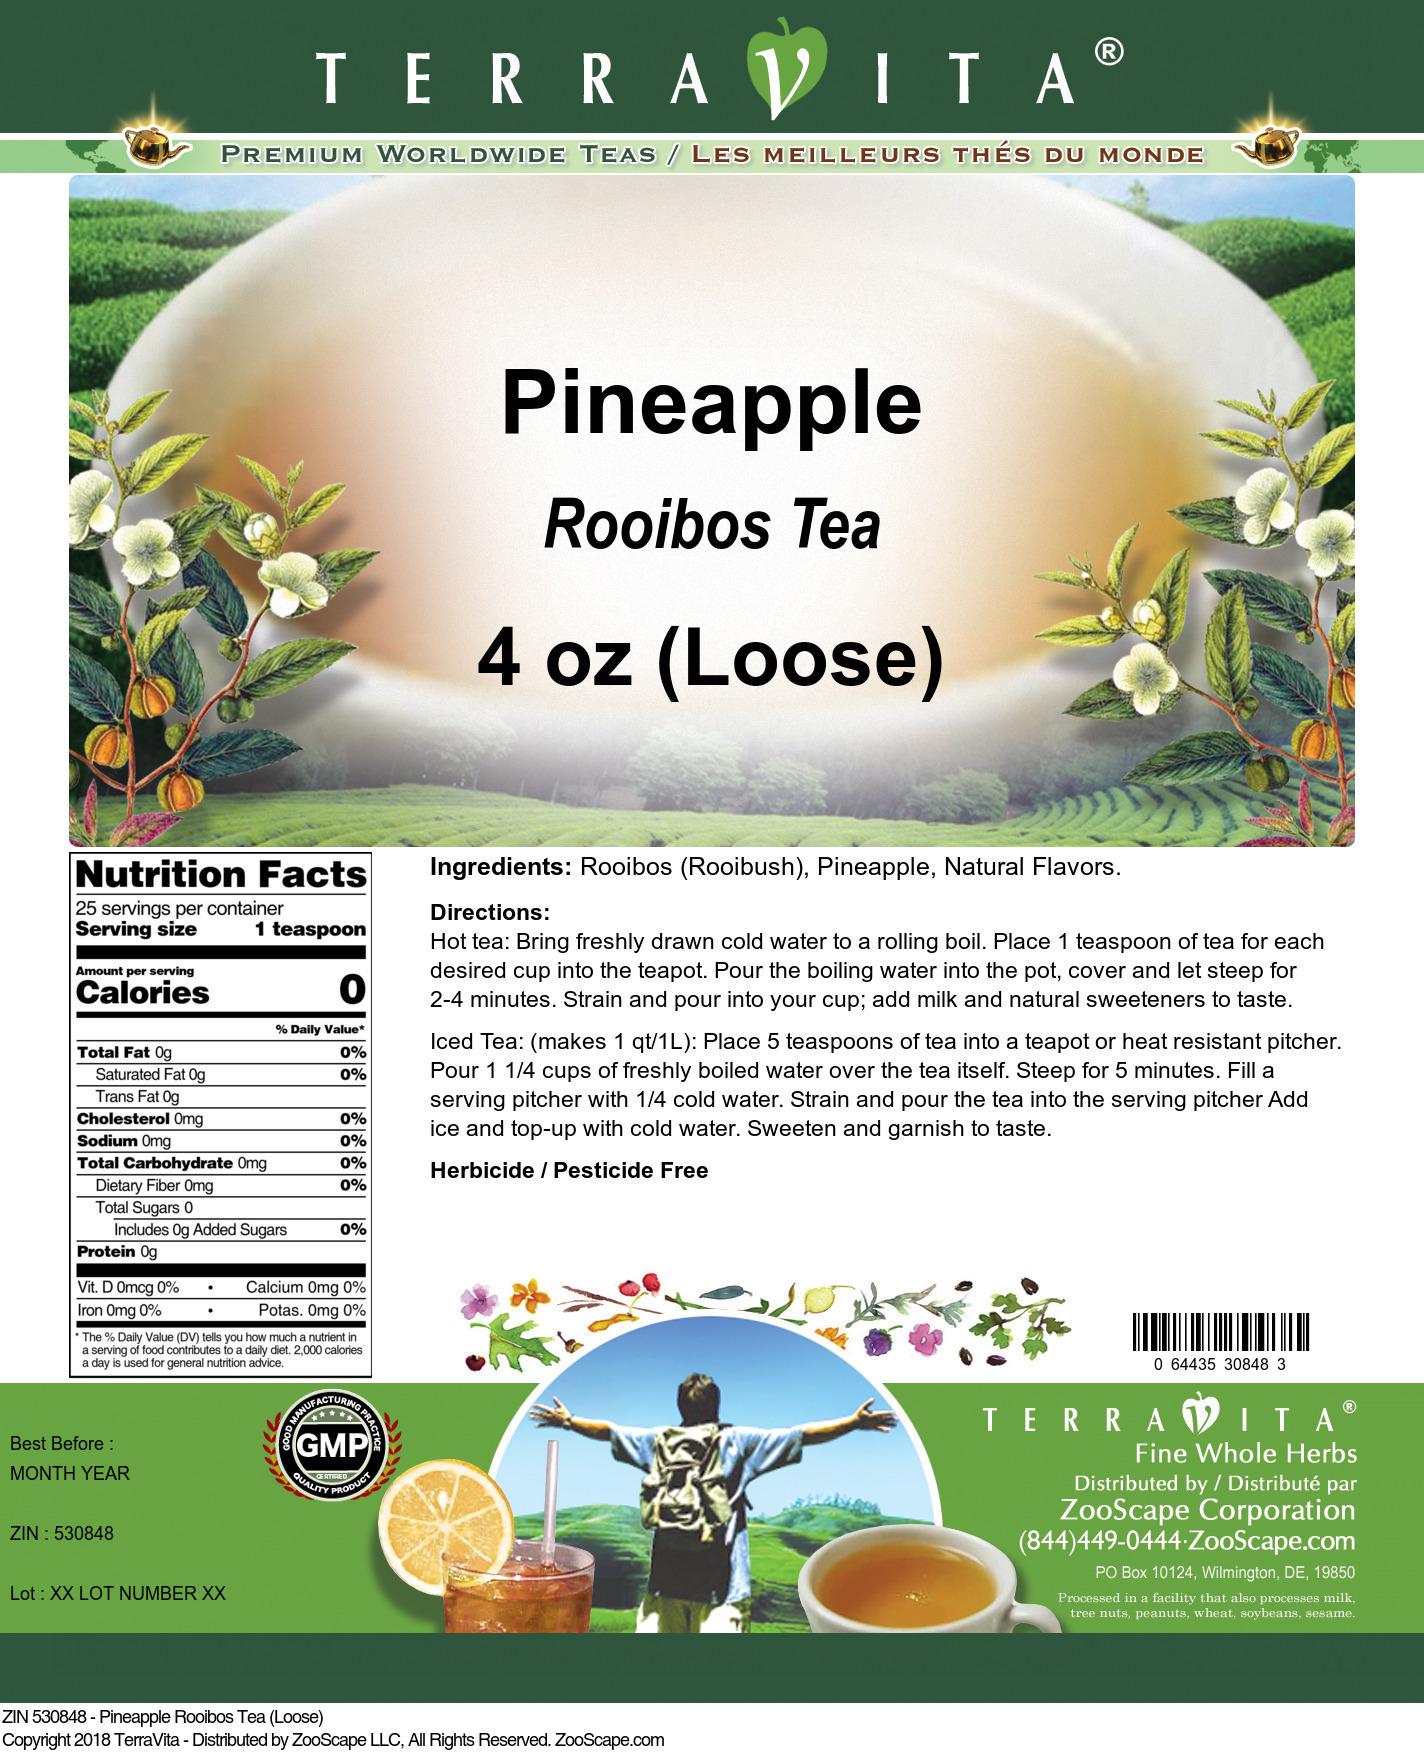 Pineapple Rooibos Tea